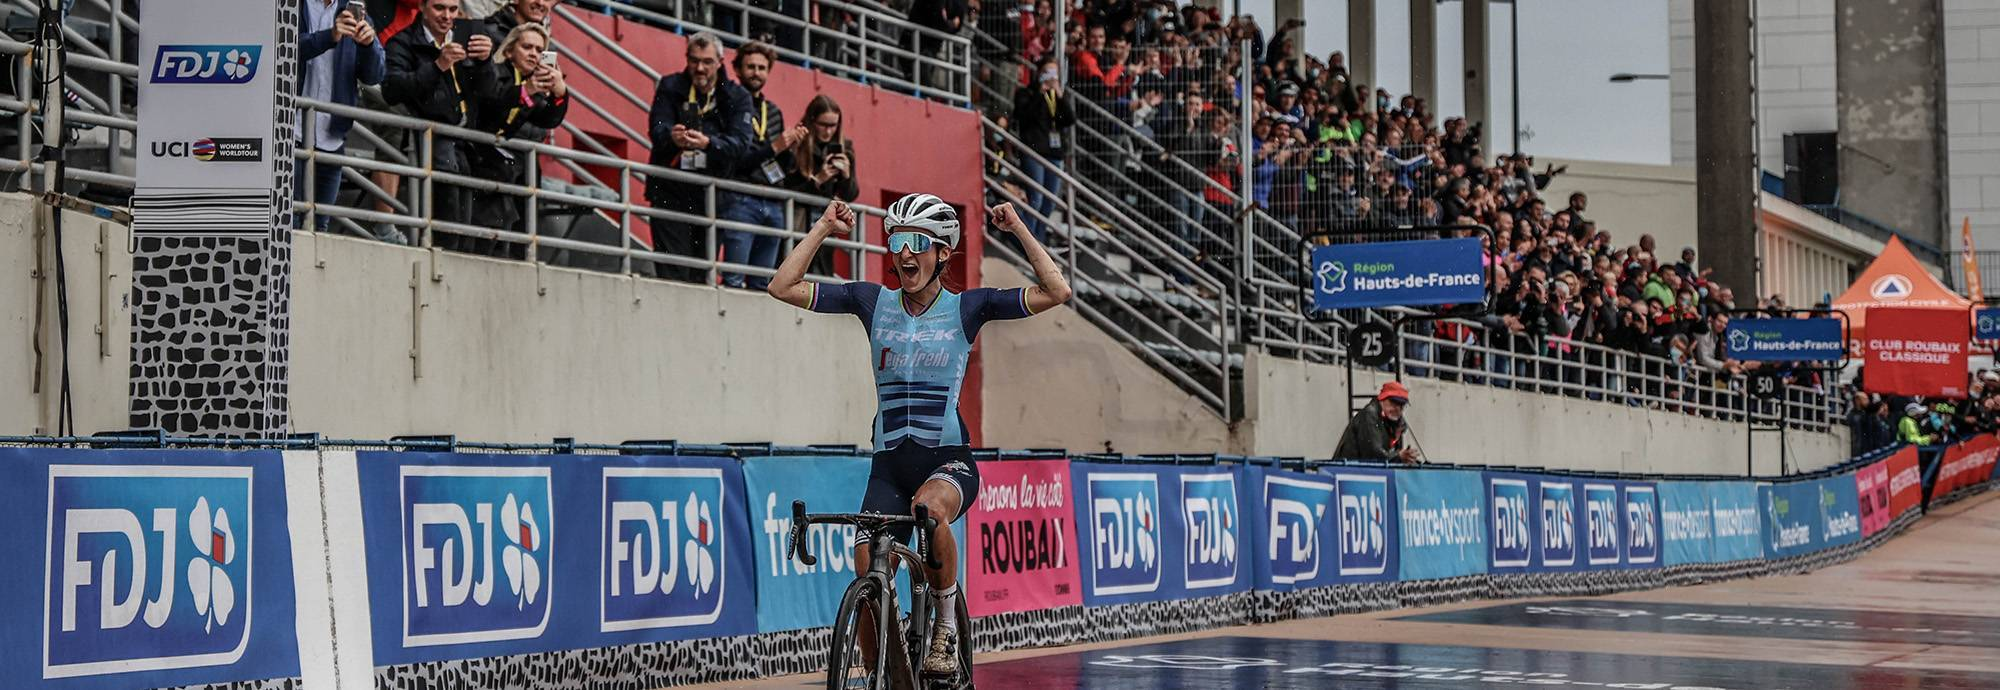 Header: Denain > Roubaix